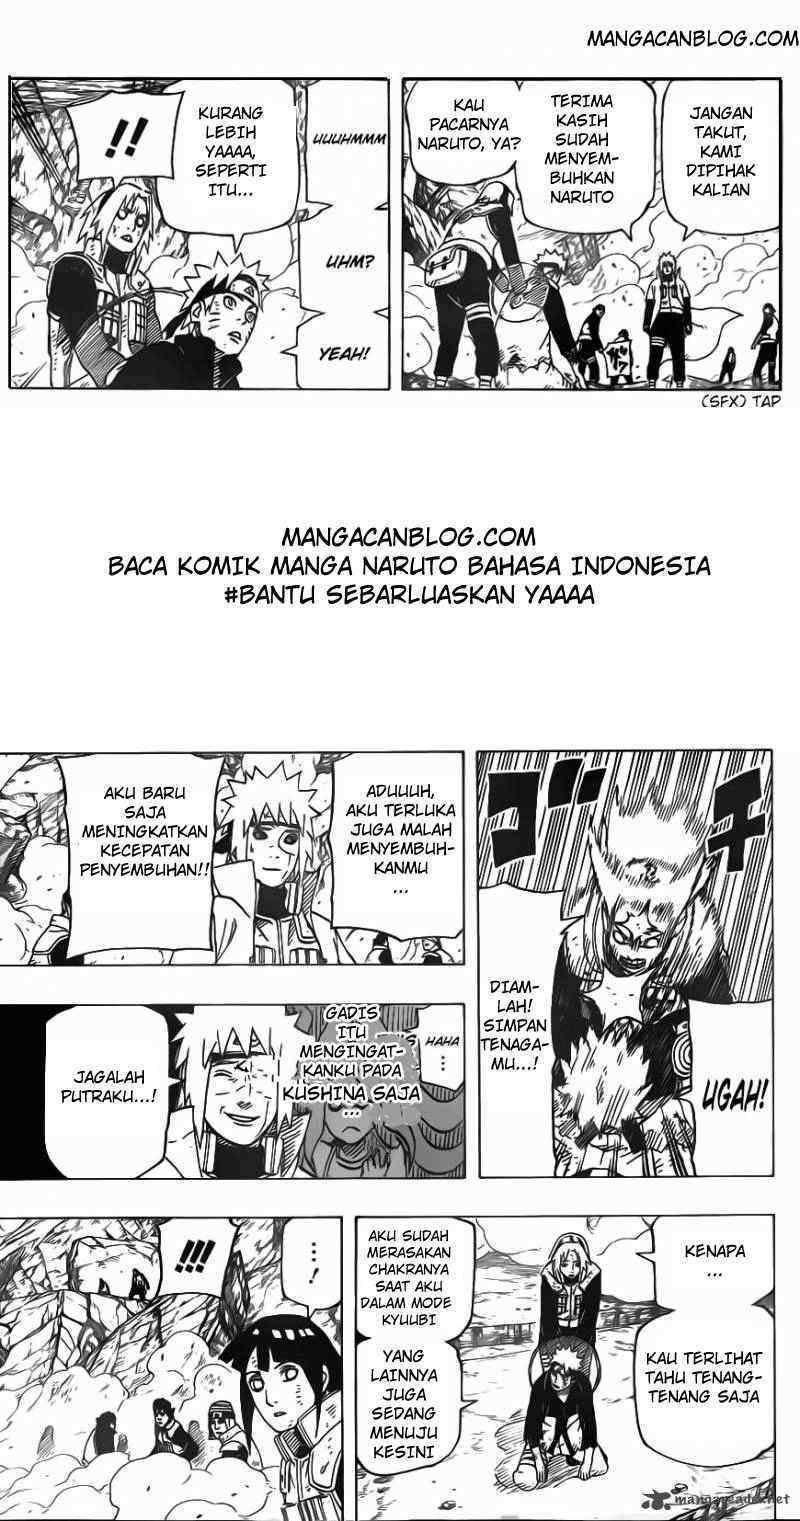 Komik naruto 631 - Tim 7 632 Indonesia naruto 631 - Tim 7 Terbaru 3|Baca Manga Komik Indonesia|Mangacan